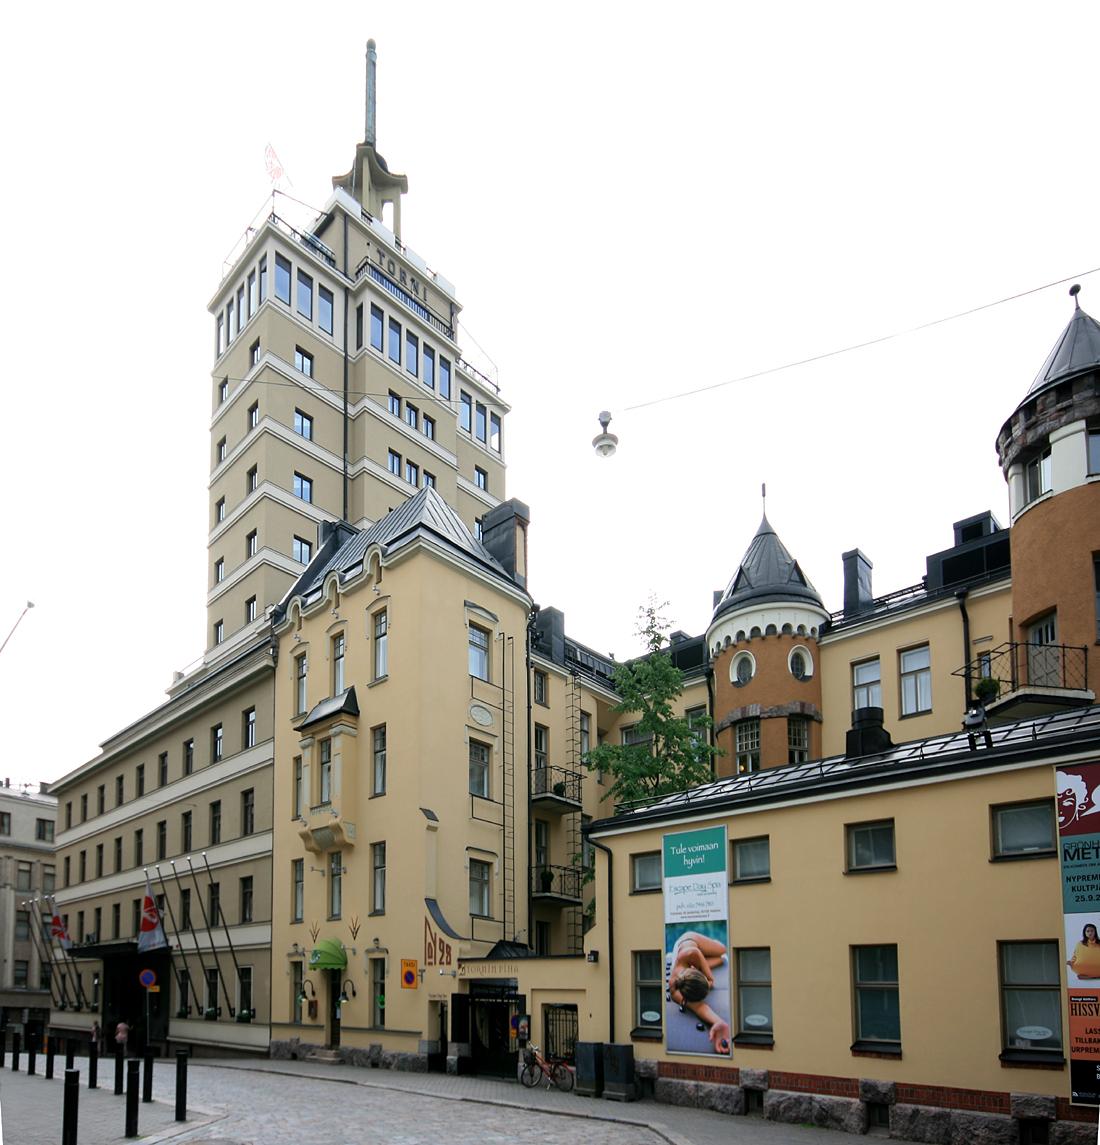 Hotelli Torni (Yrjonkatu 26, Kalevankatu 5)